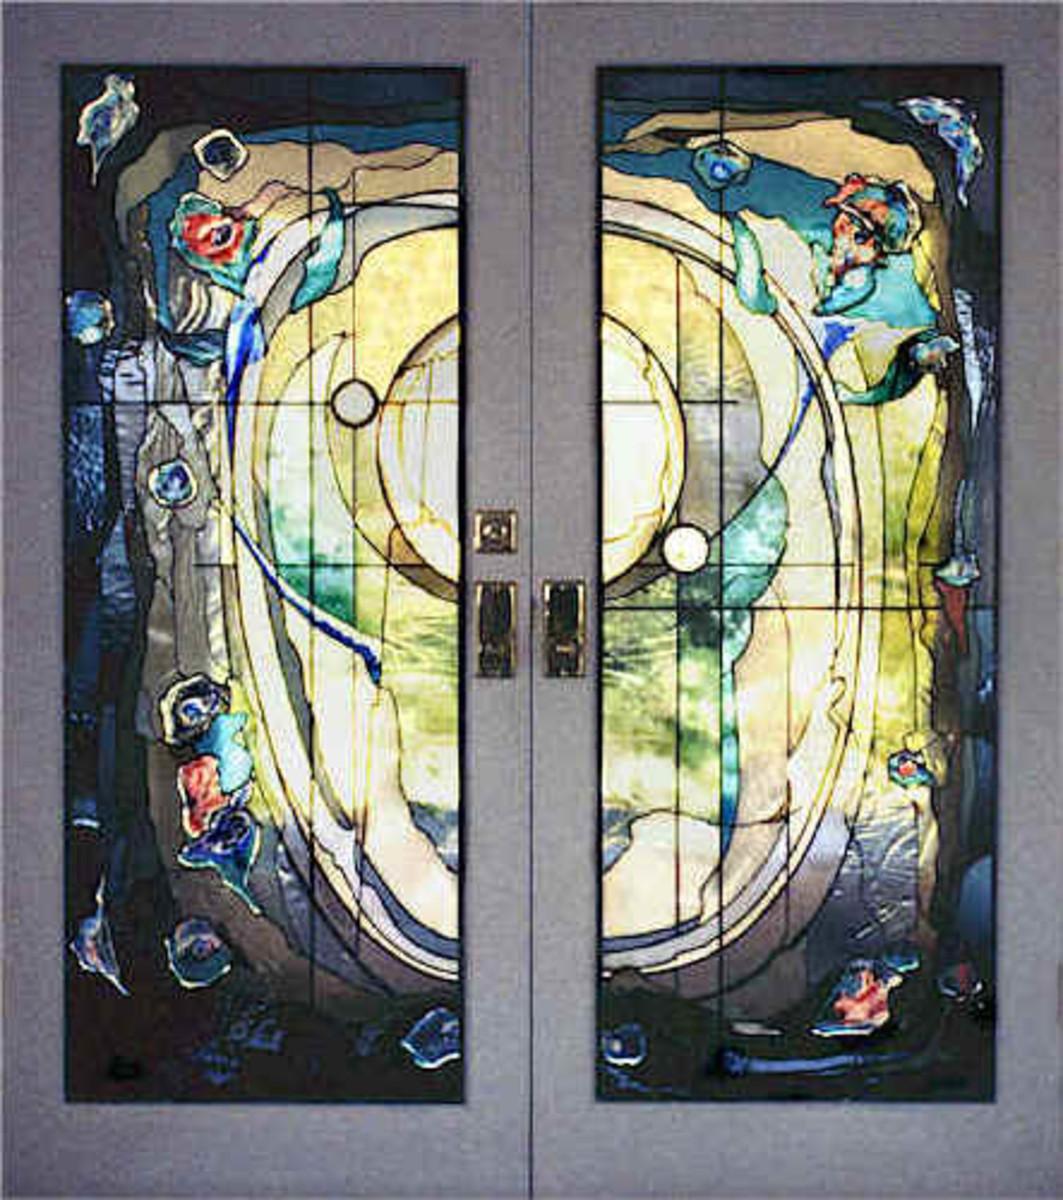 colorful glass exterior door - modern in artistic design